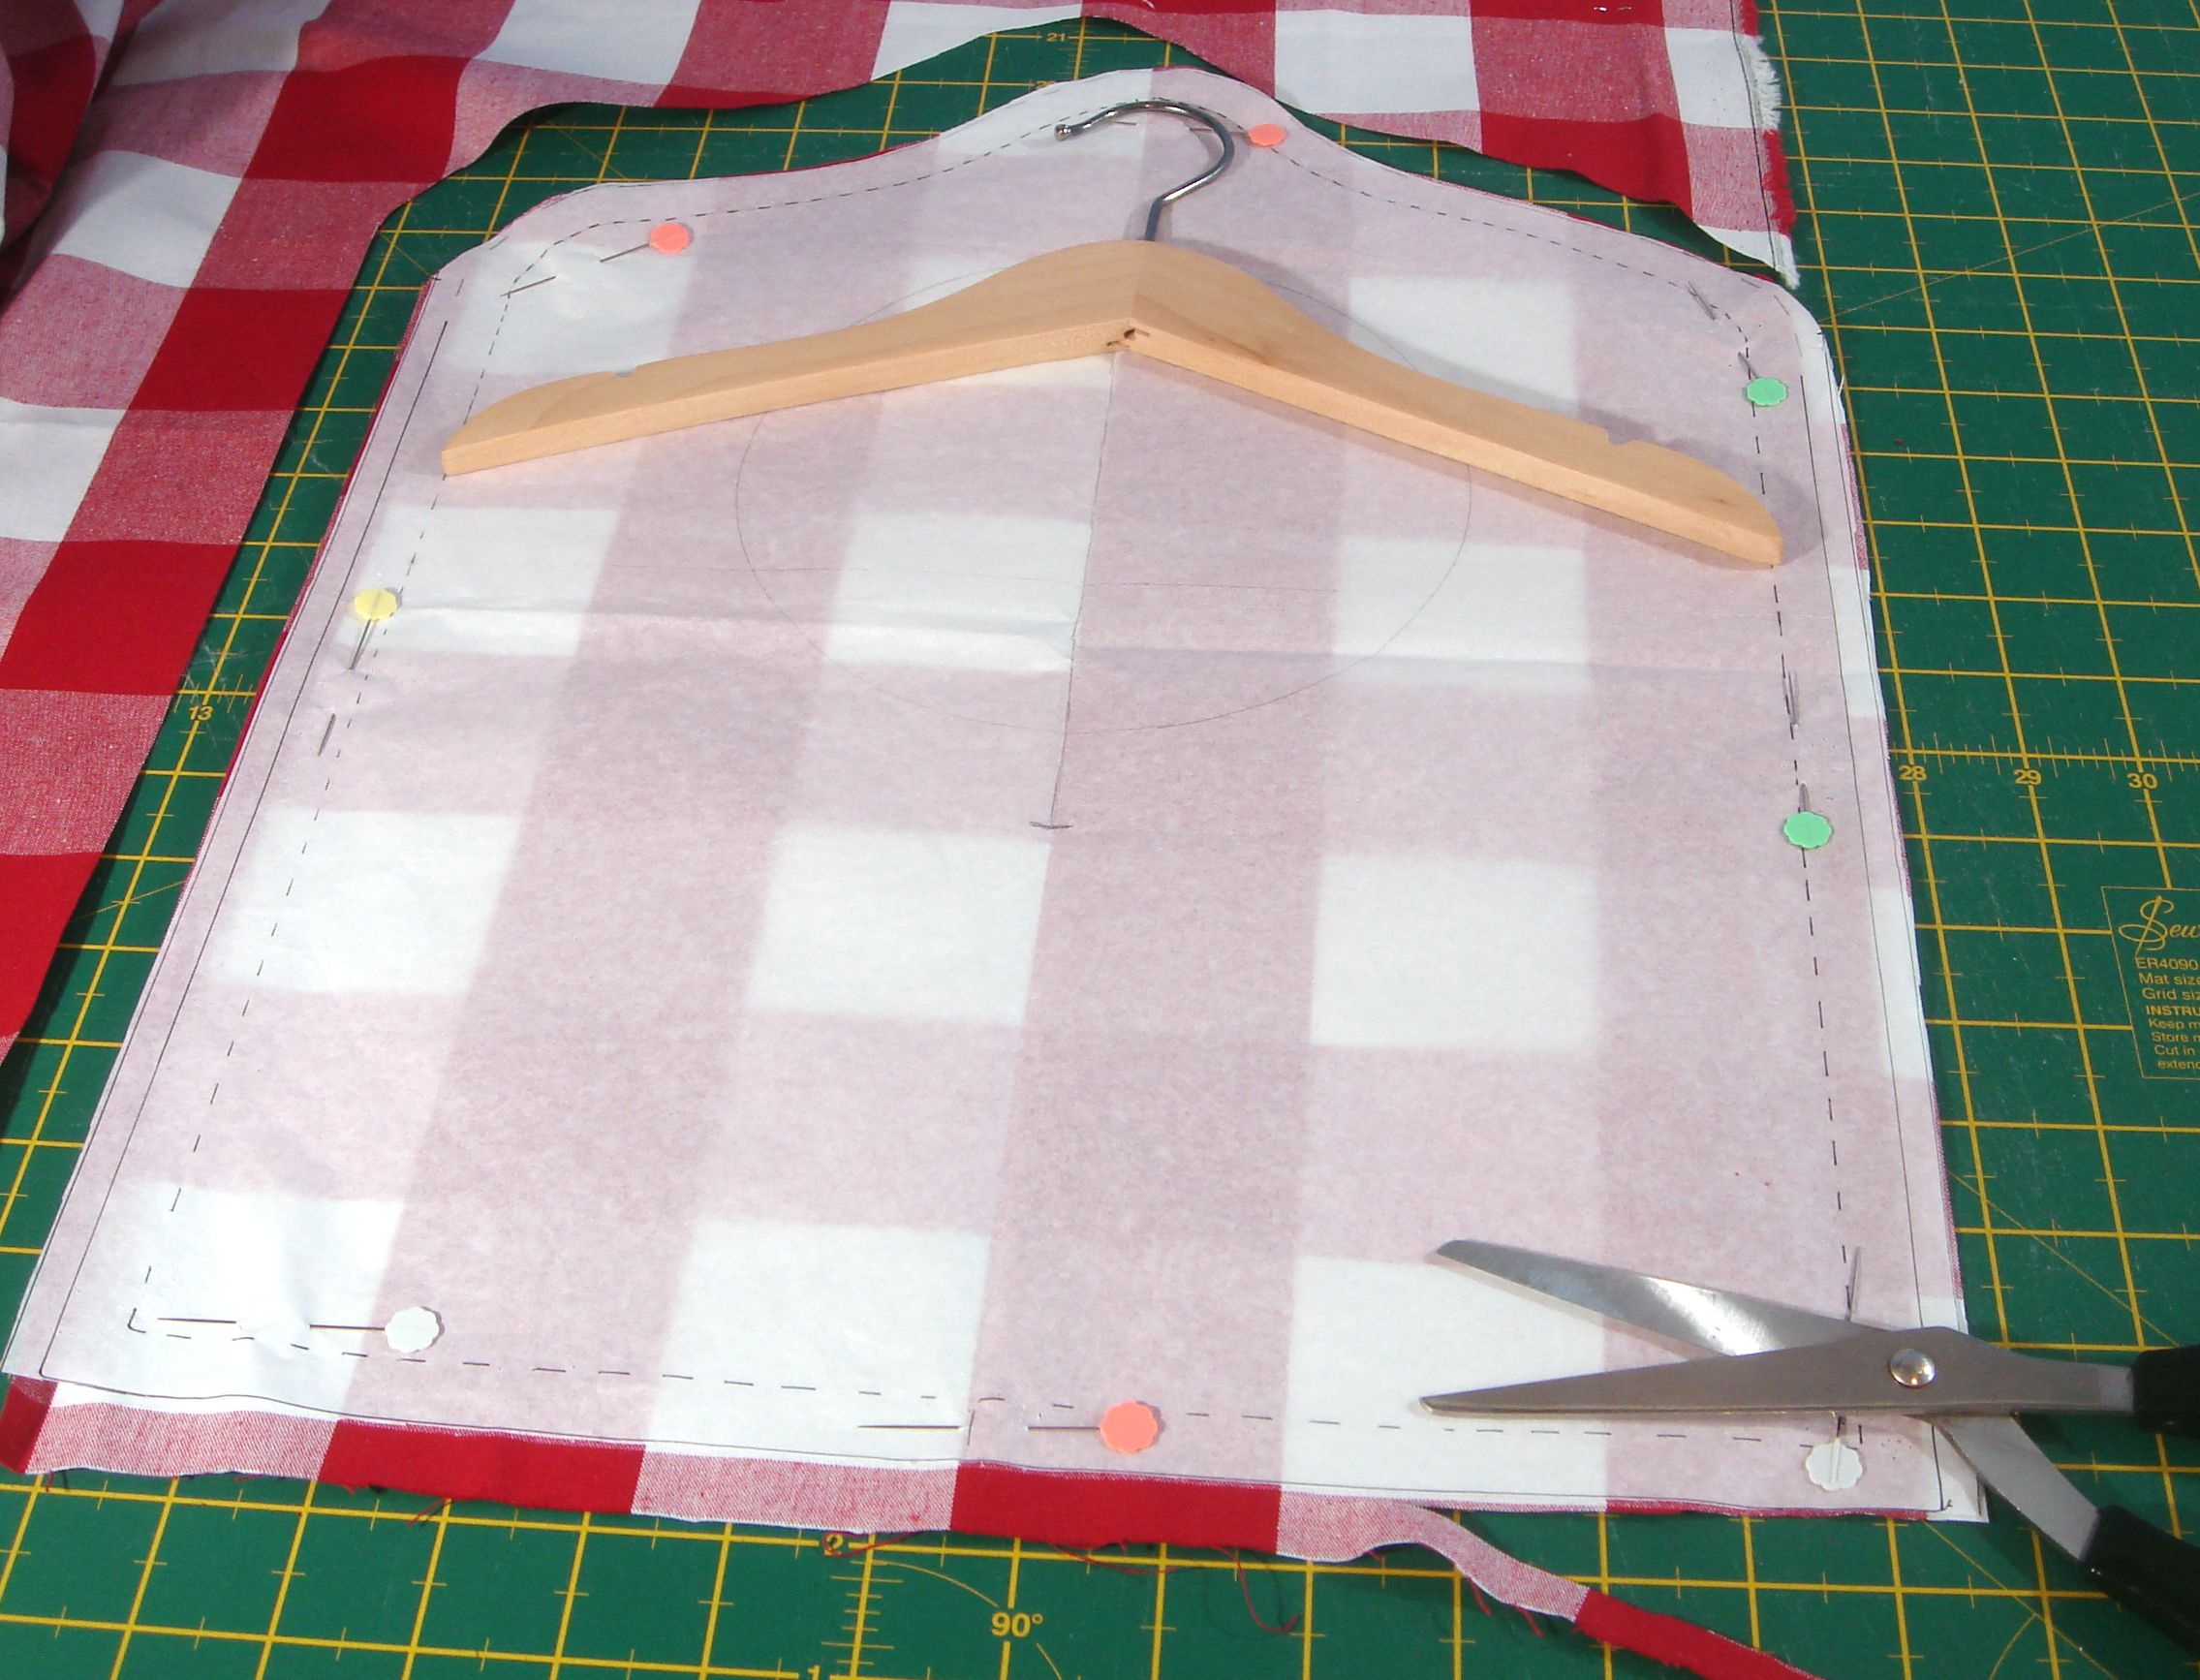 Peg bag tutorial | Pinterest | Patterns, Bag and Peg bag